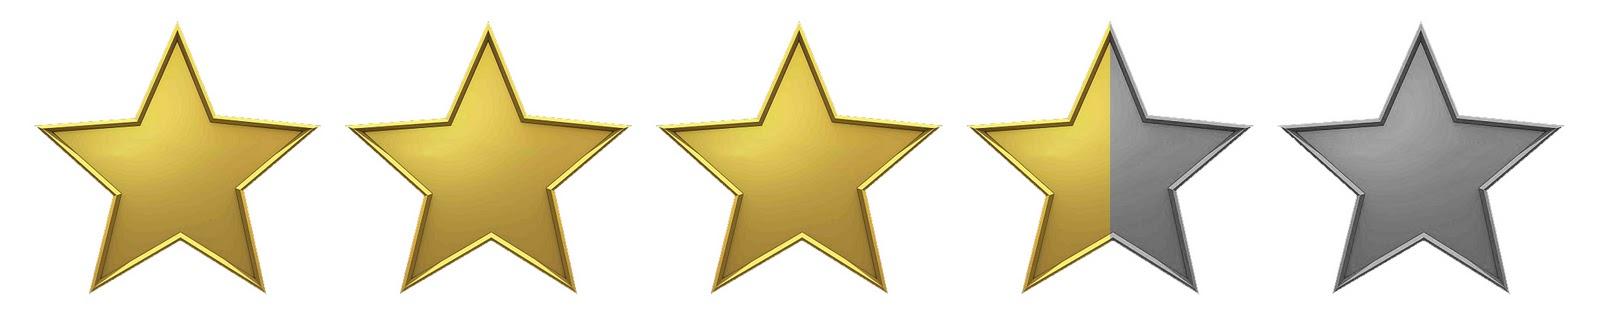 Spoiler Review: THOR: TALES OF ASGARD